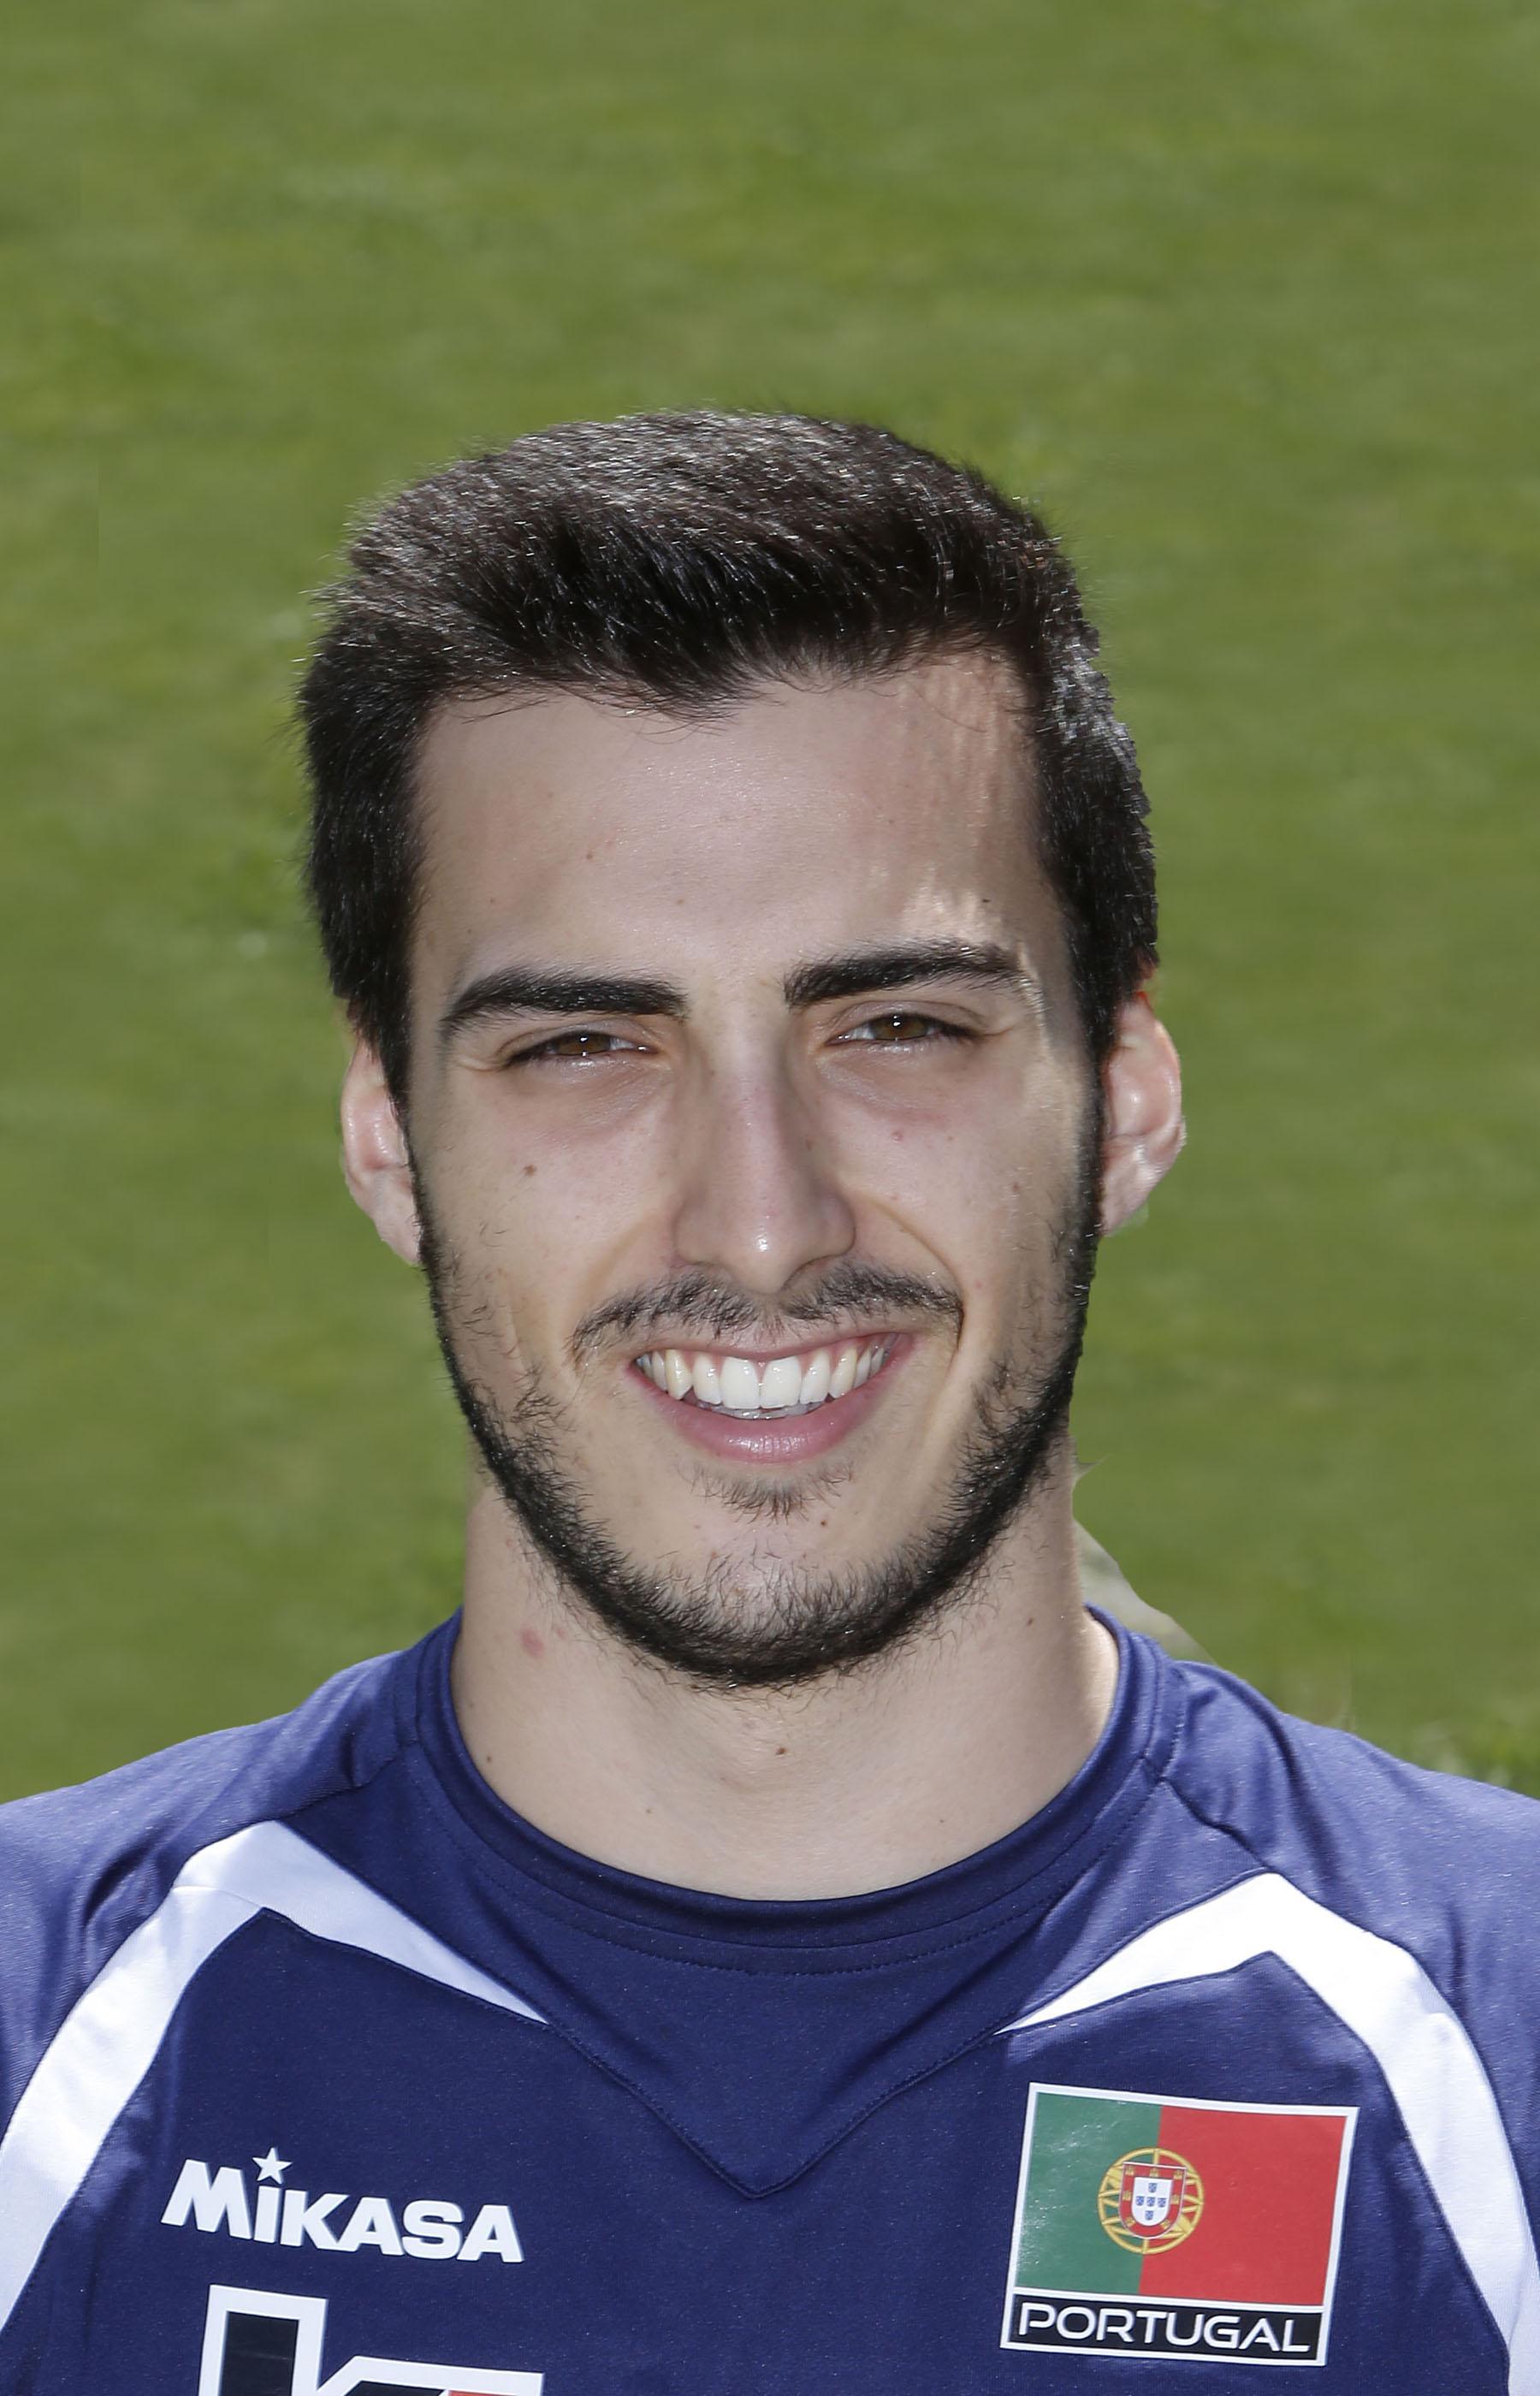 Miguel Tavares Rodrigues